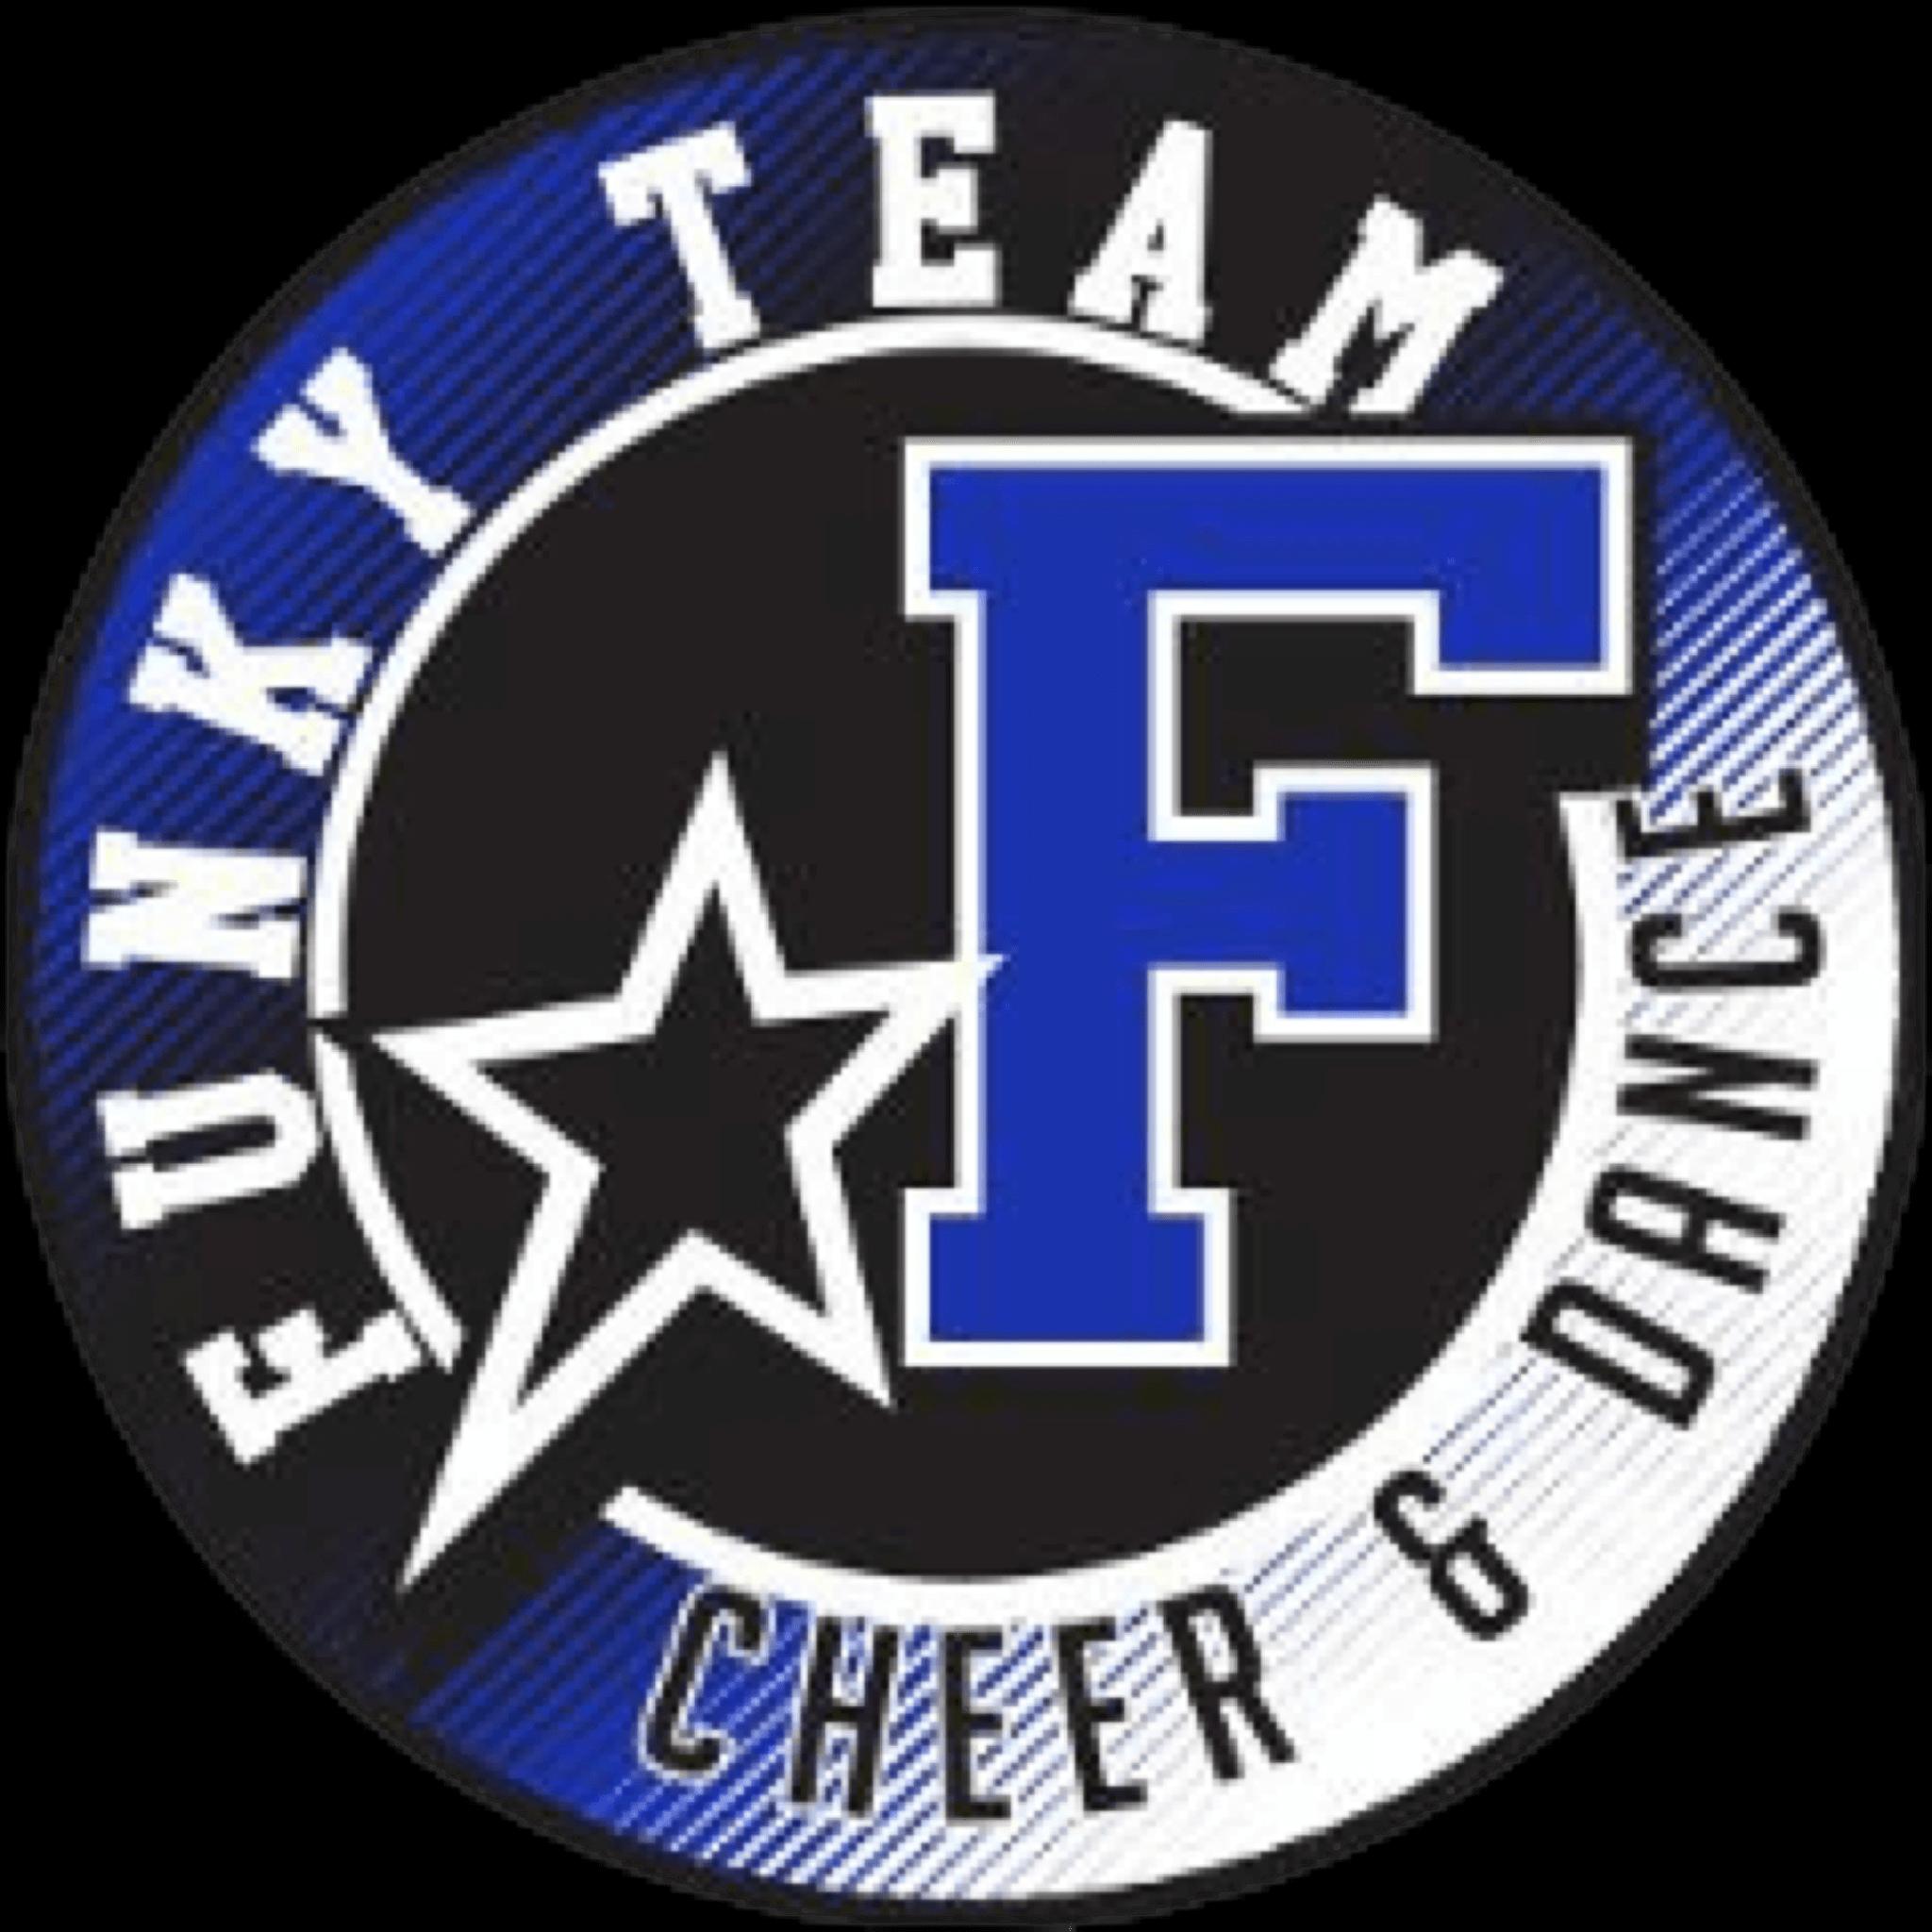 Funky Team Ry urheiluseuran logo